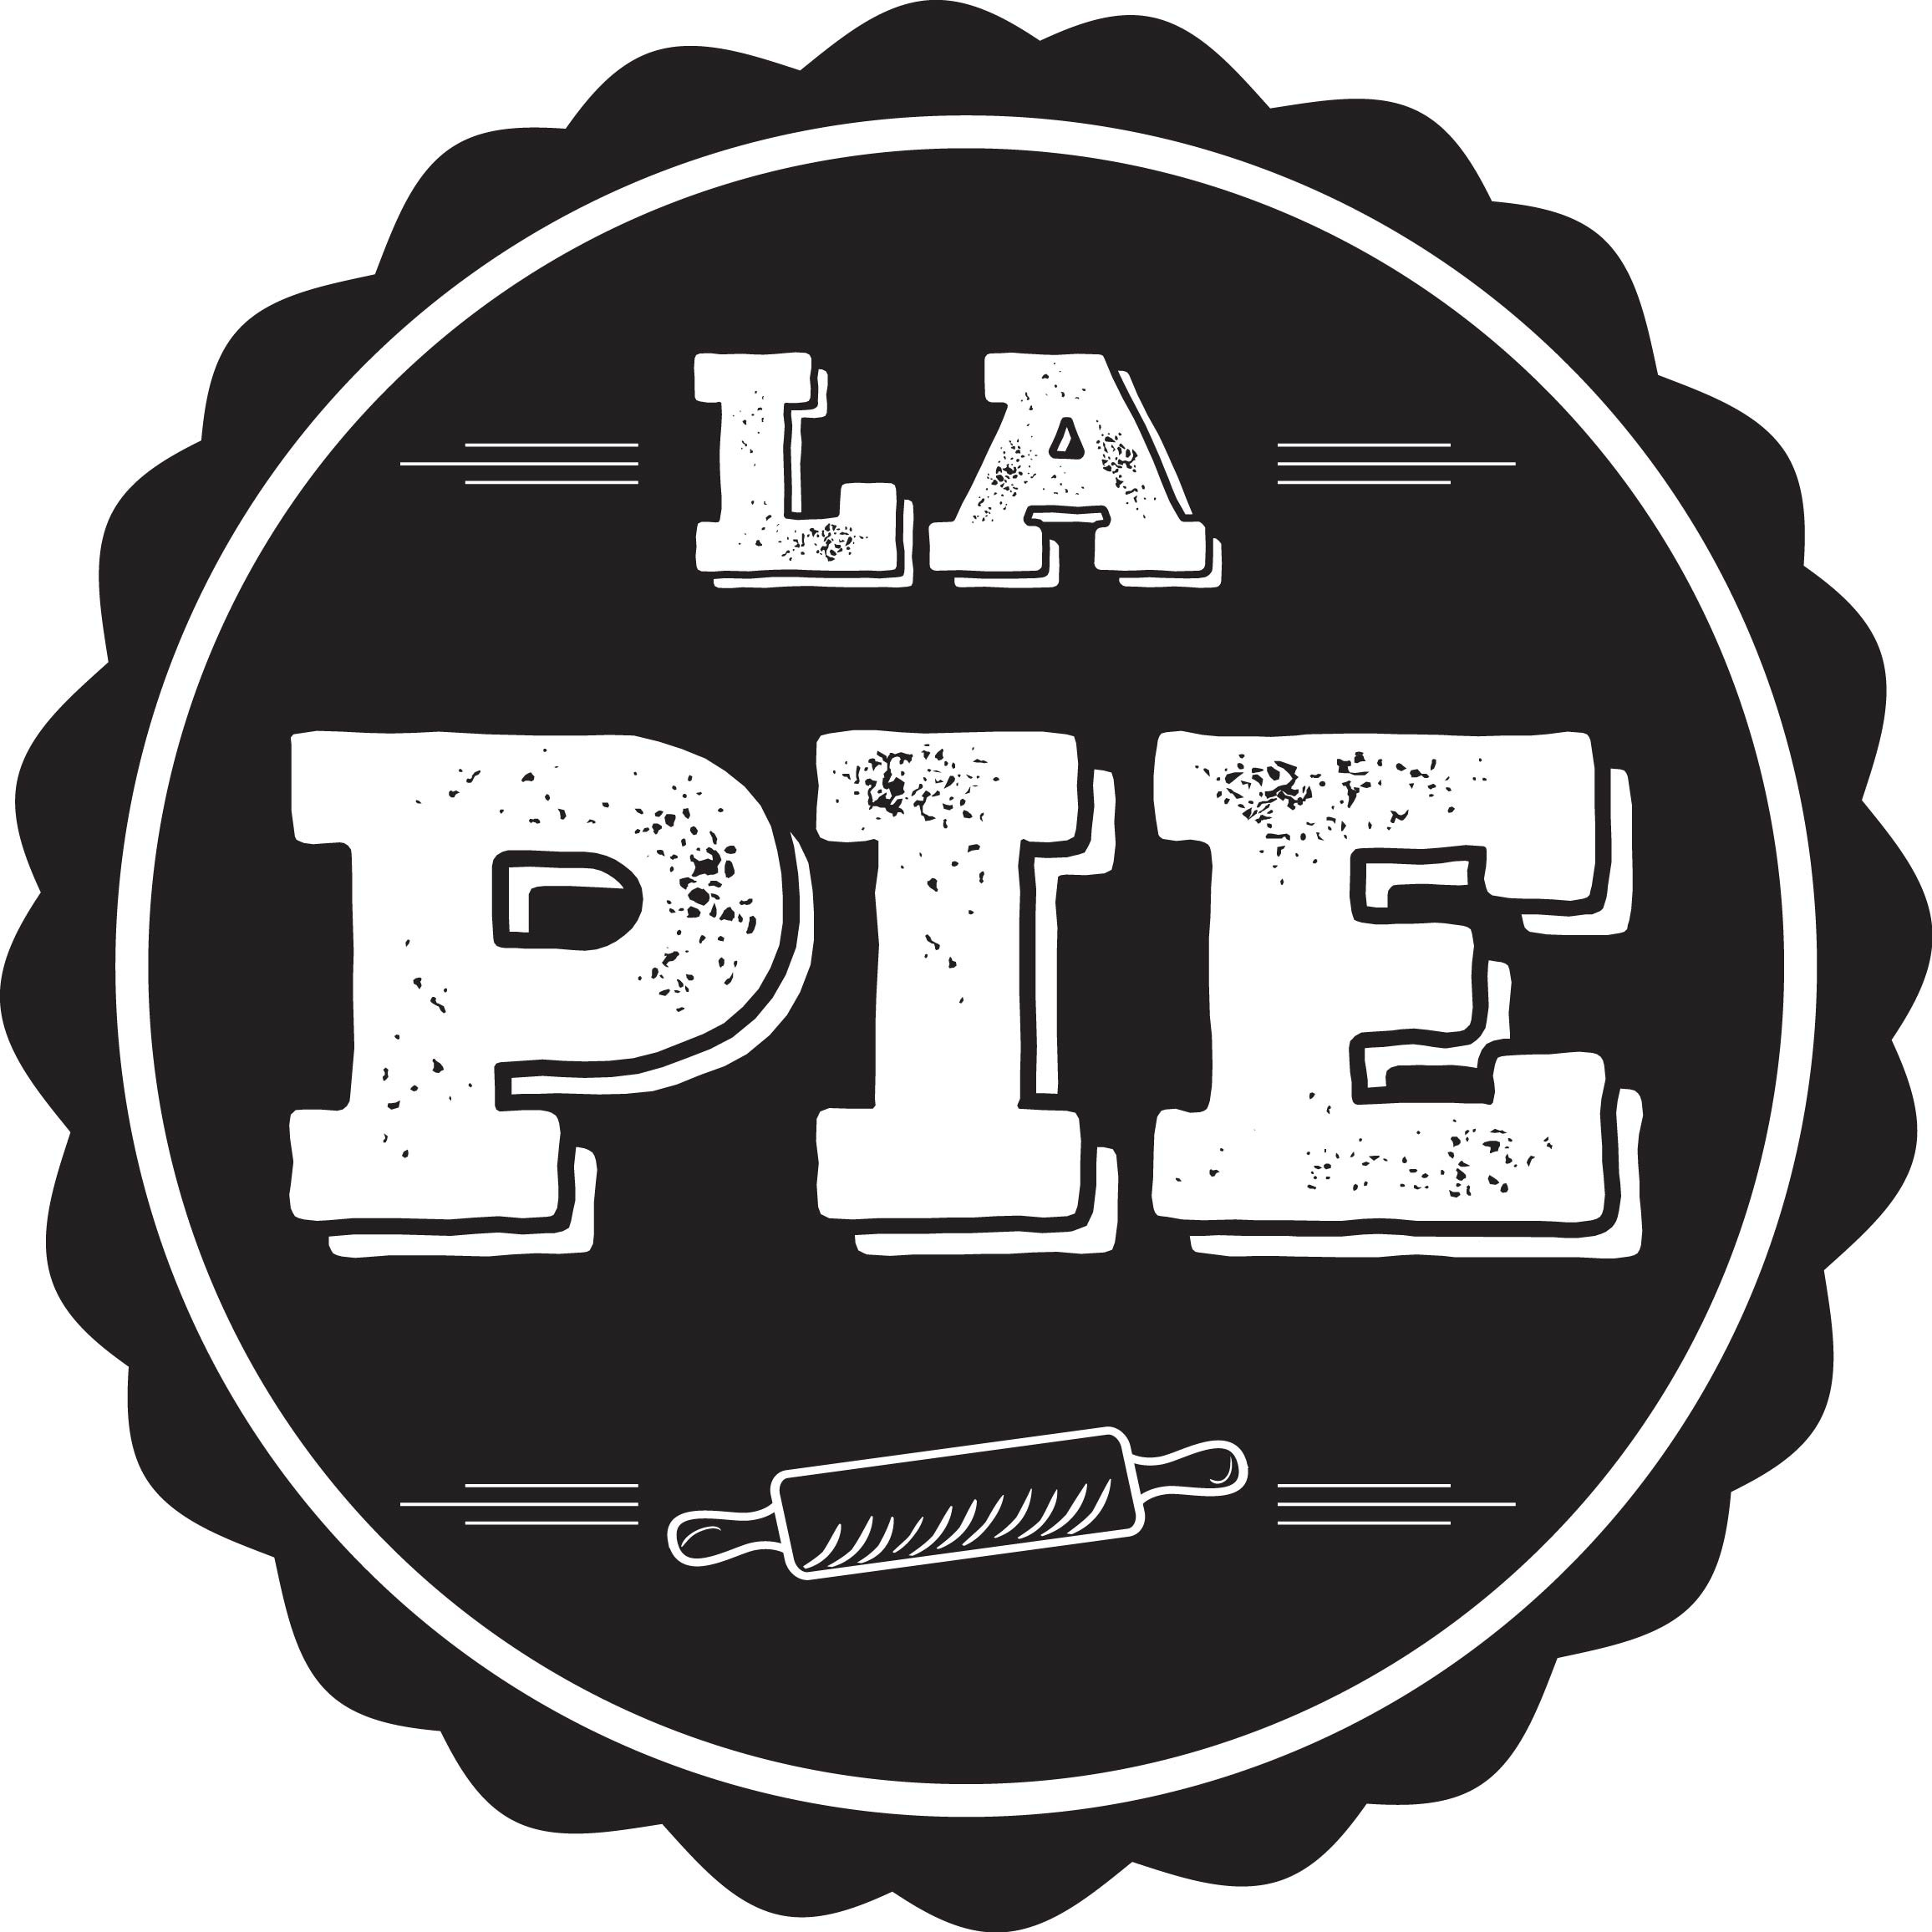 Design a memorable logo for our pie house